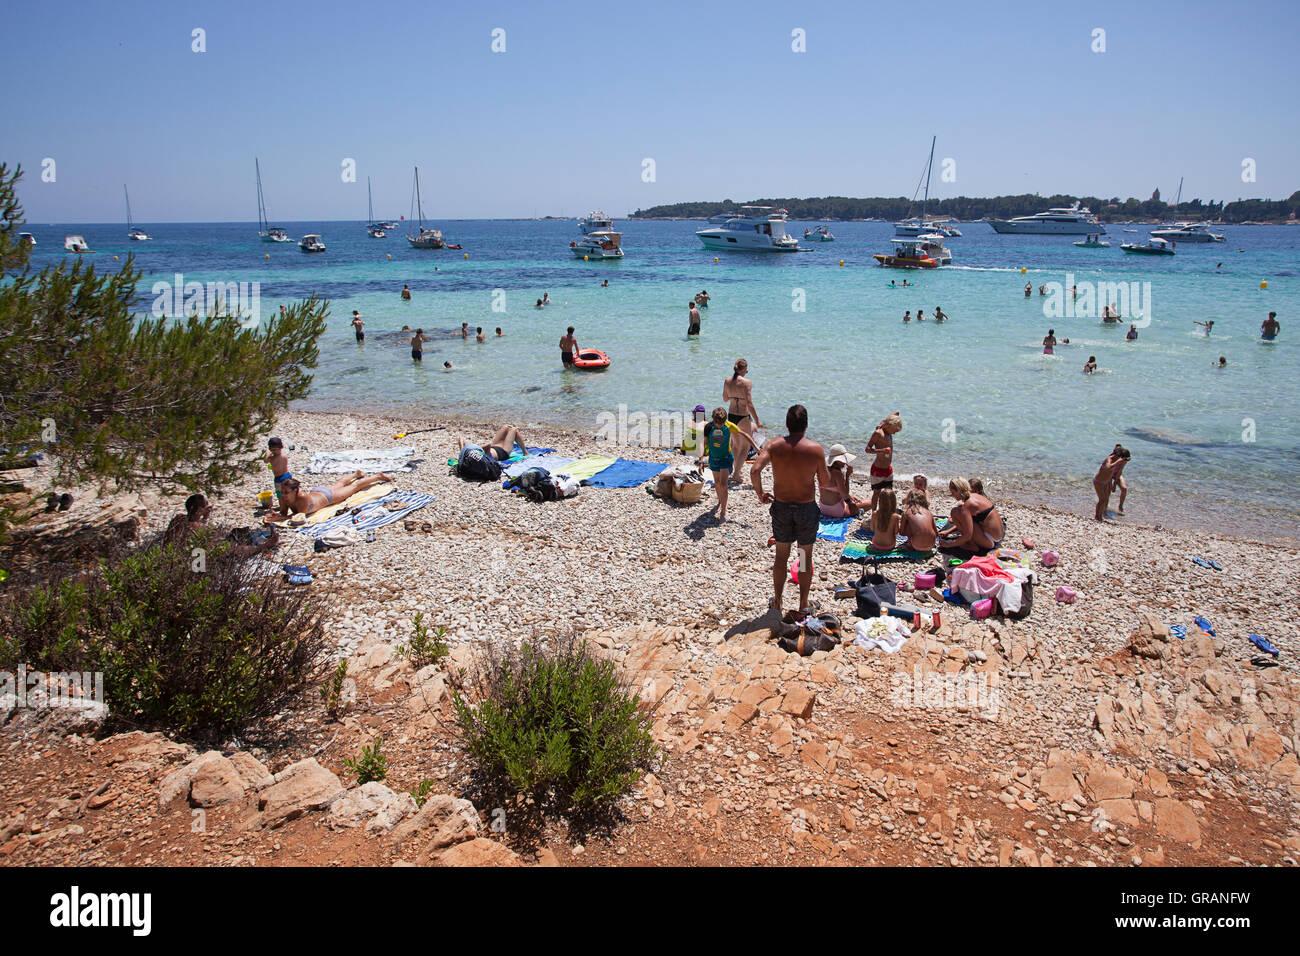 Île Sainte Margerite Stockfotos & Île Sainte Margerite Bilder - Alamy